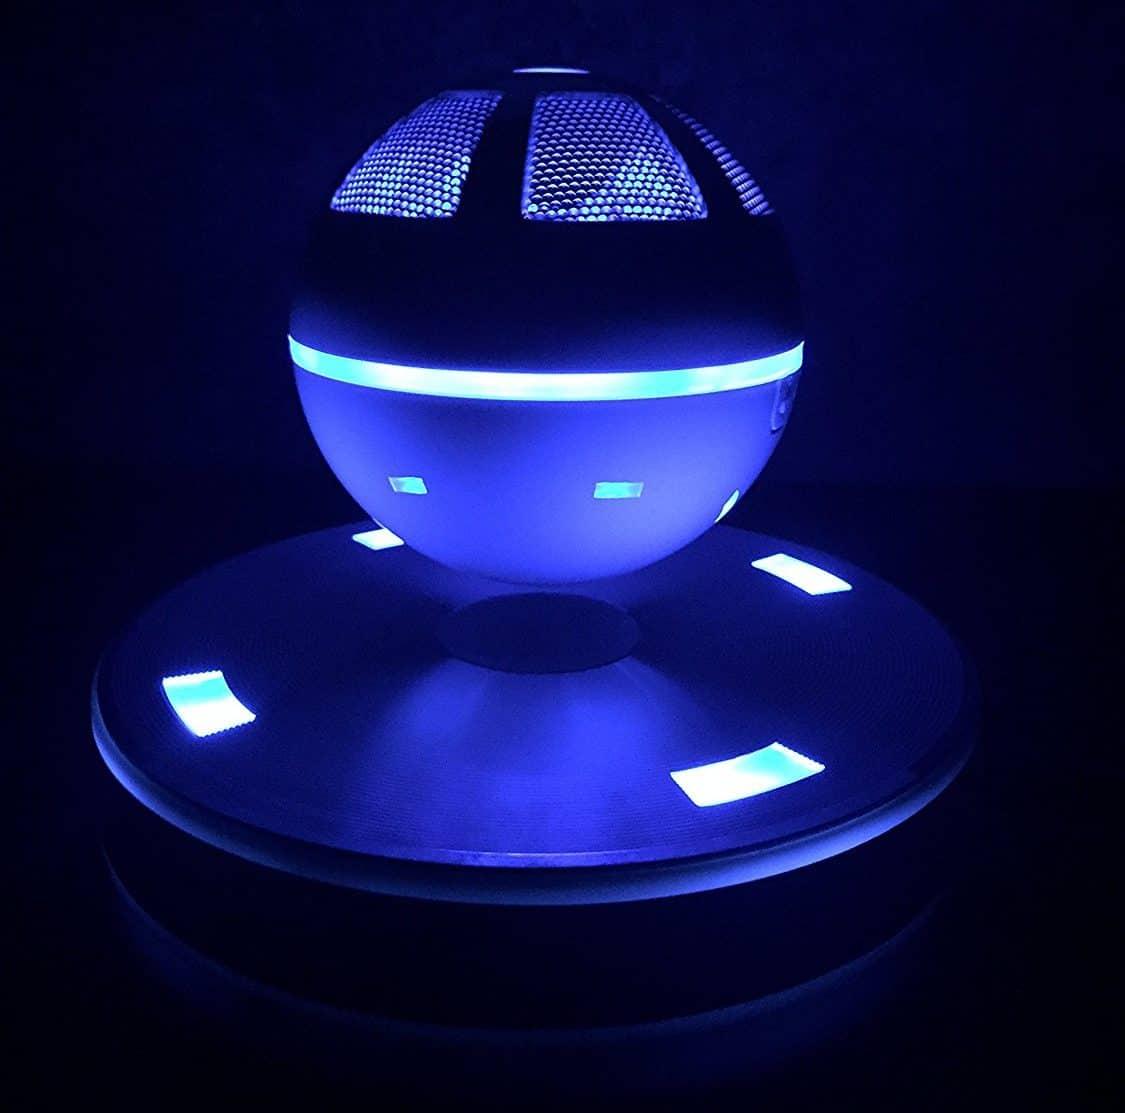 Levitating/Floating Wireless Portable Bluetooth Speaker